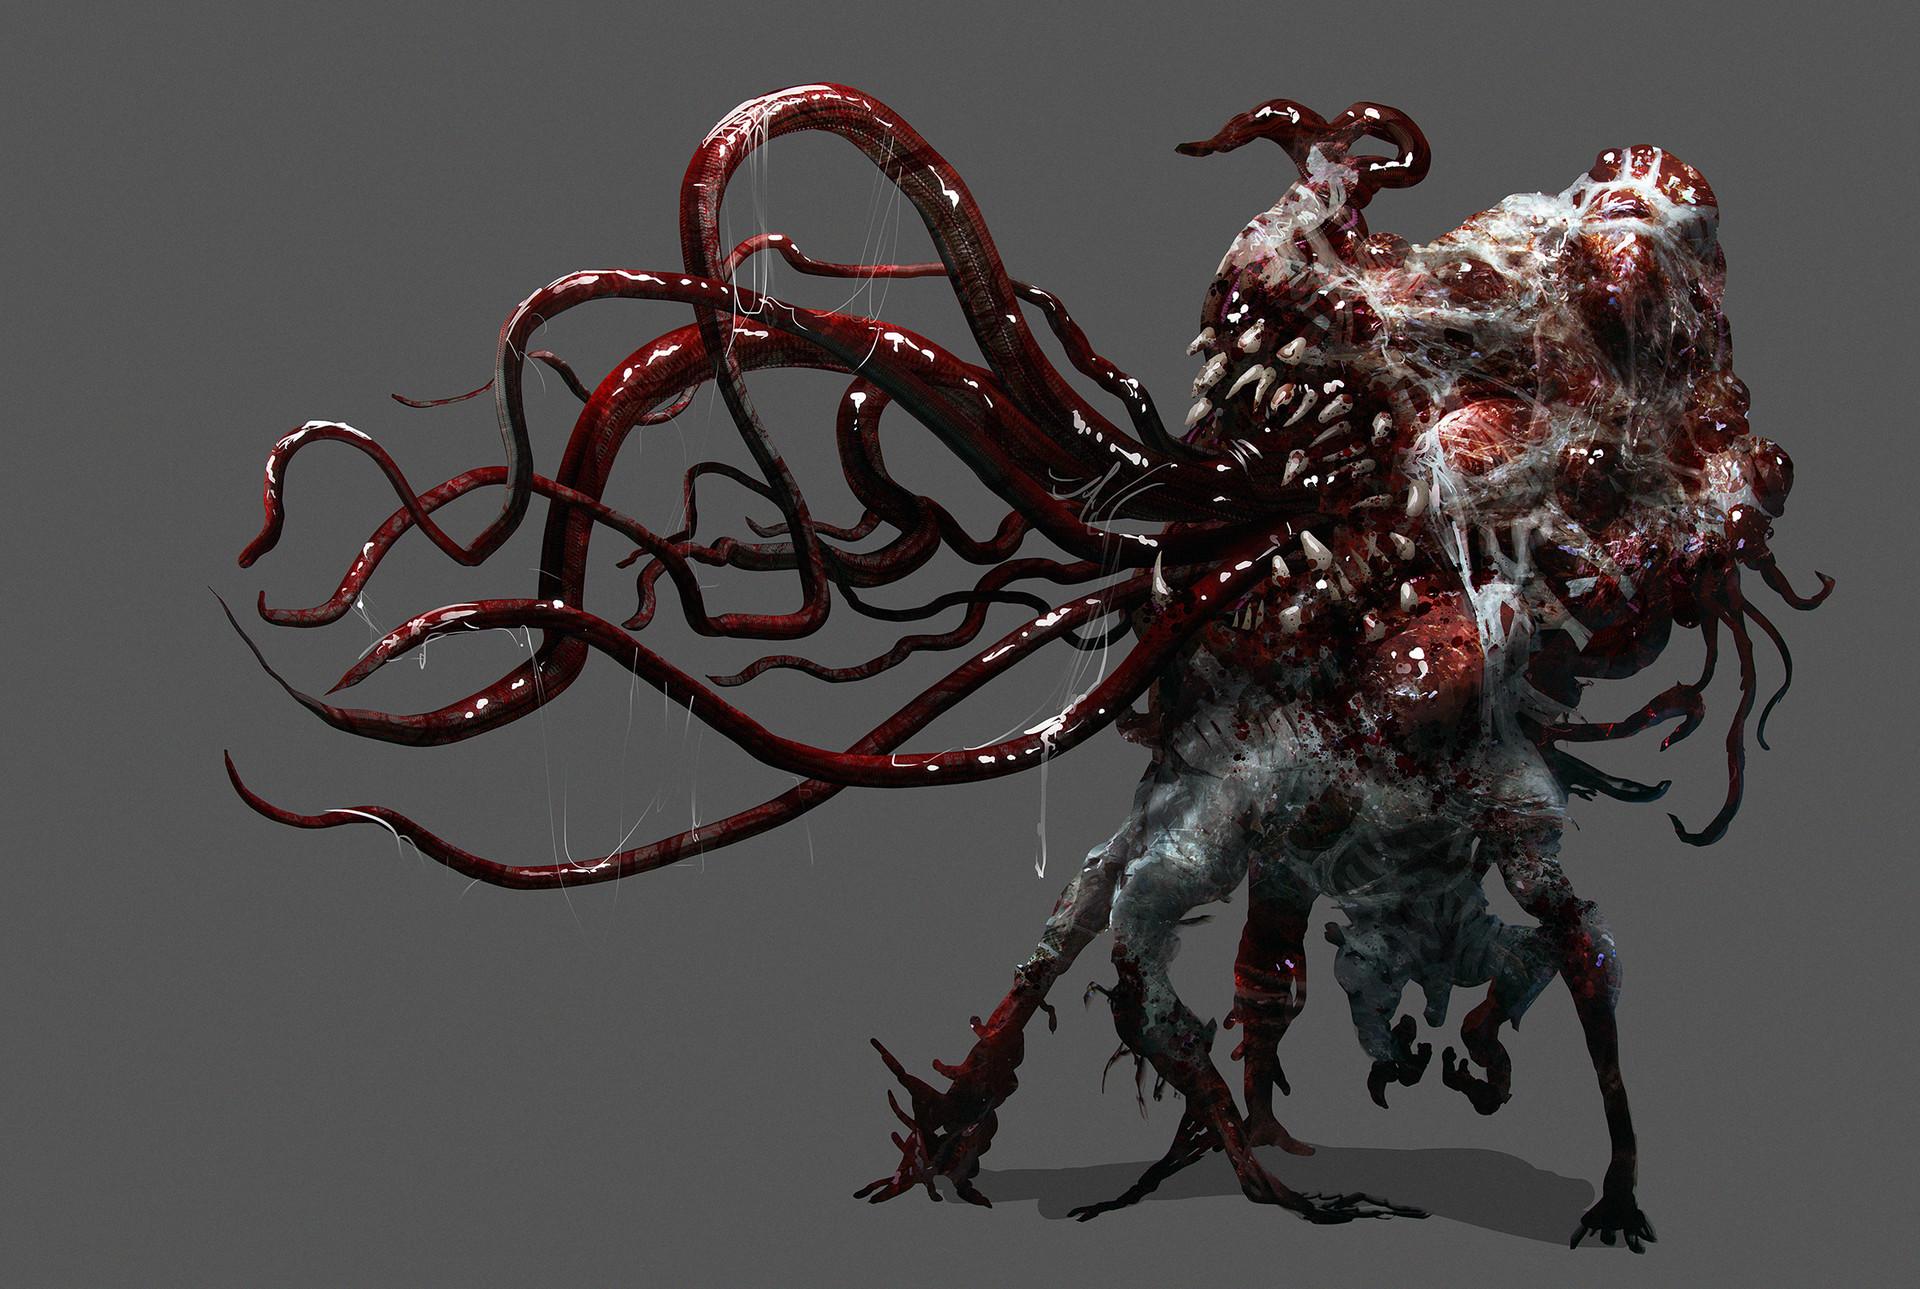 Chenthooran nambiarooran necromorph7sm